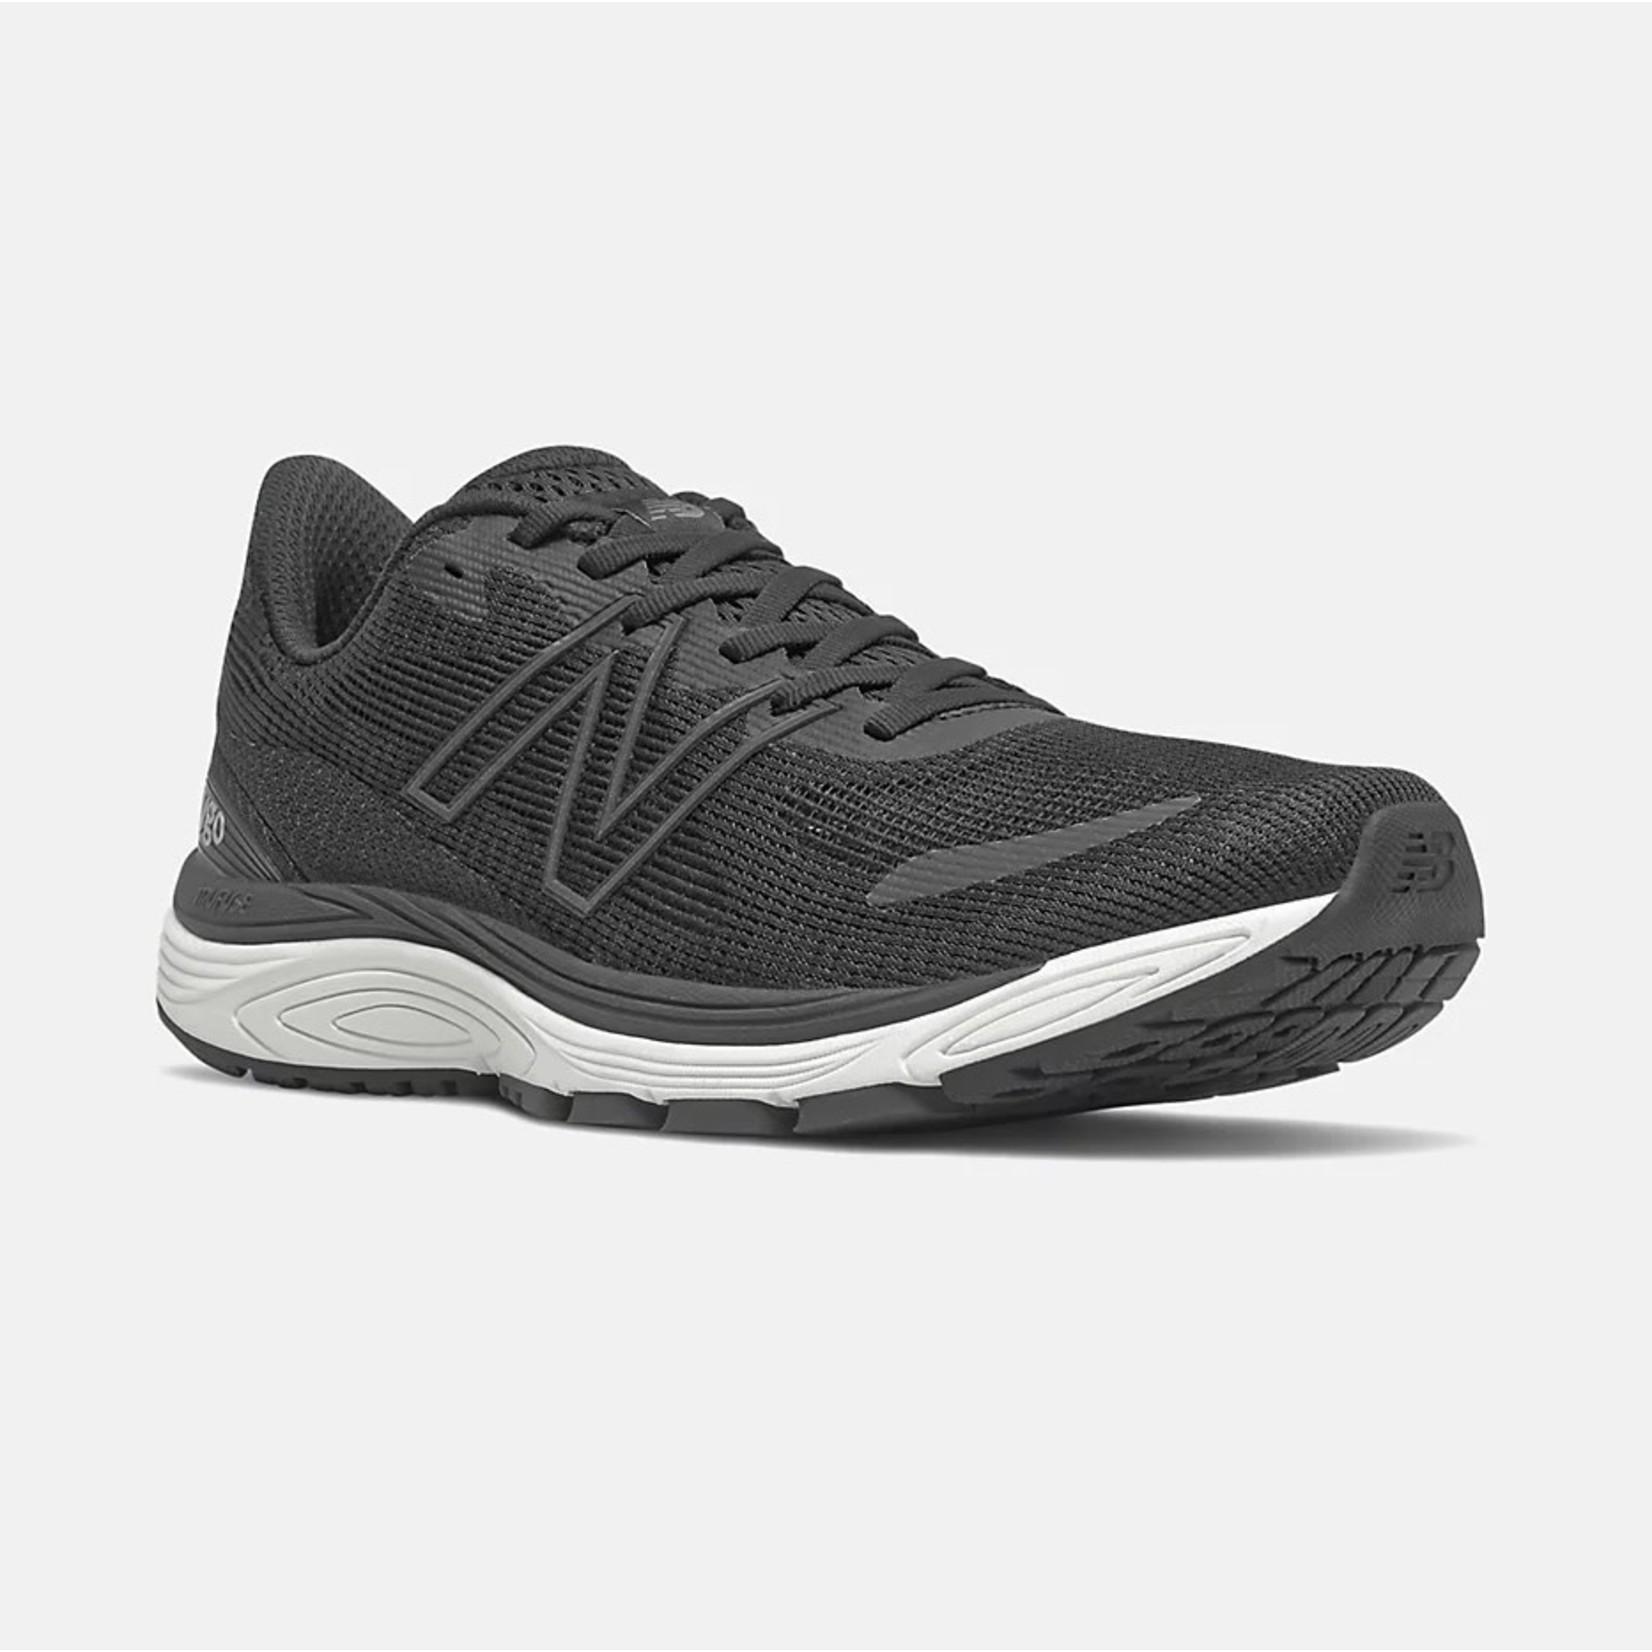 New Balance New Balance Running Shoes, Vaygo v2, Mens